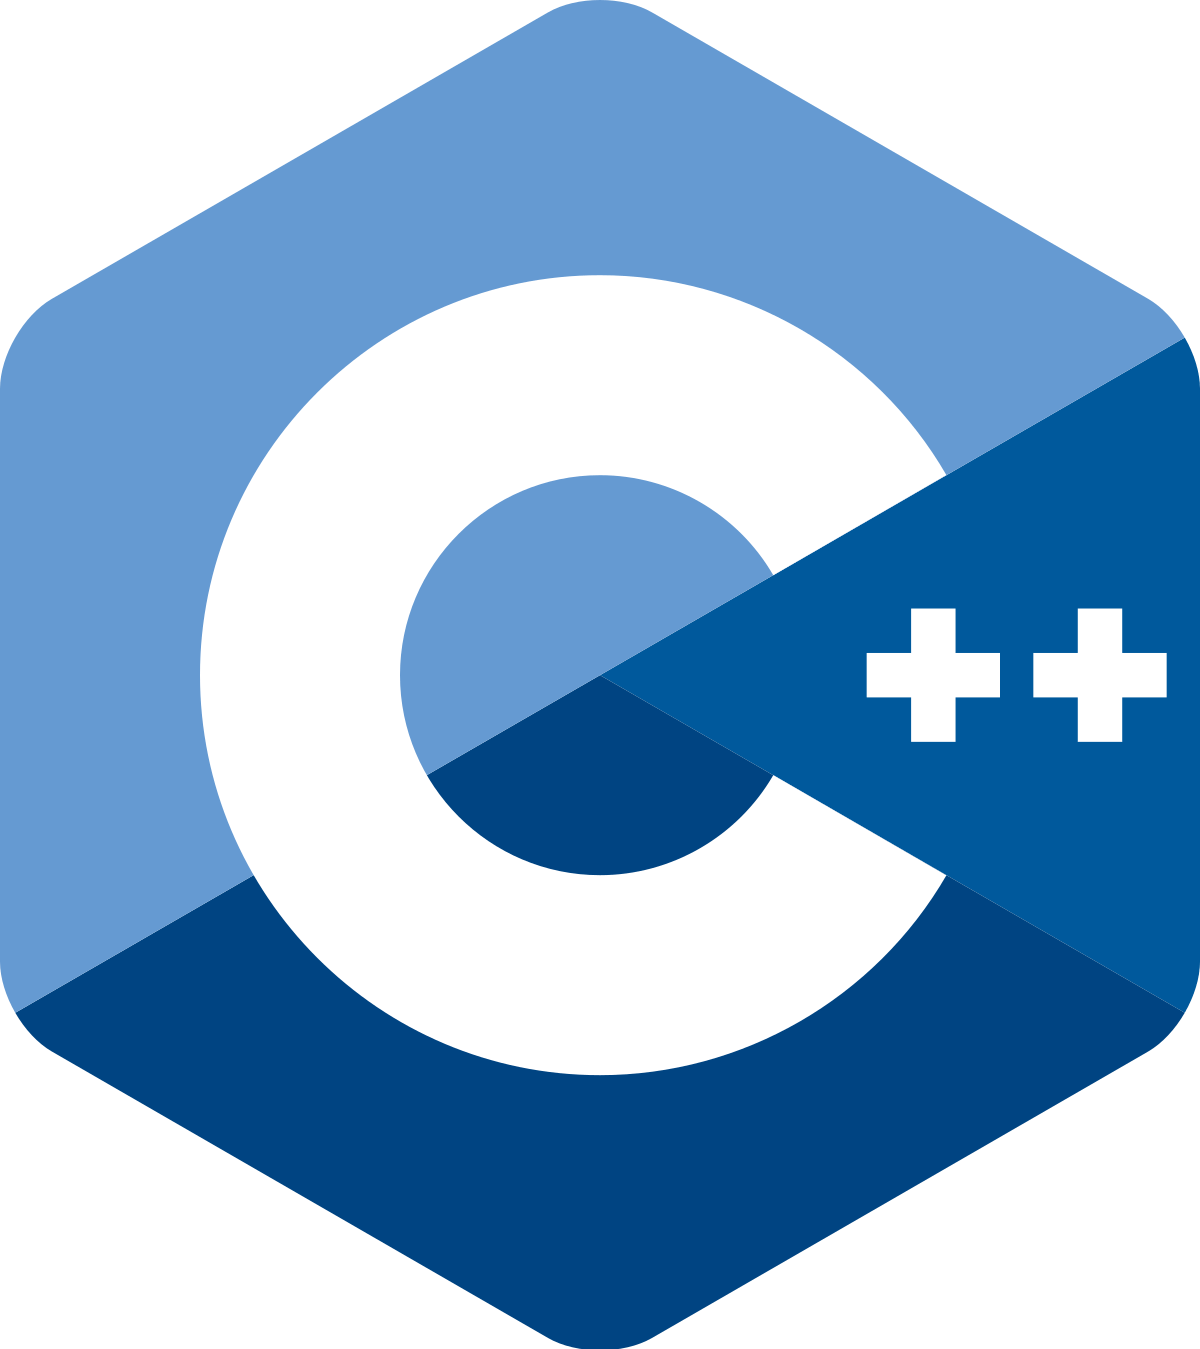 C++ Language , IOS Programming Languages